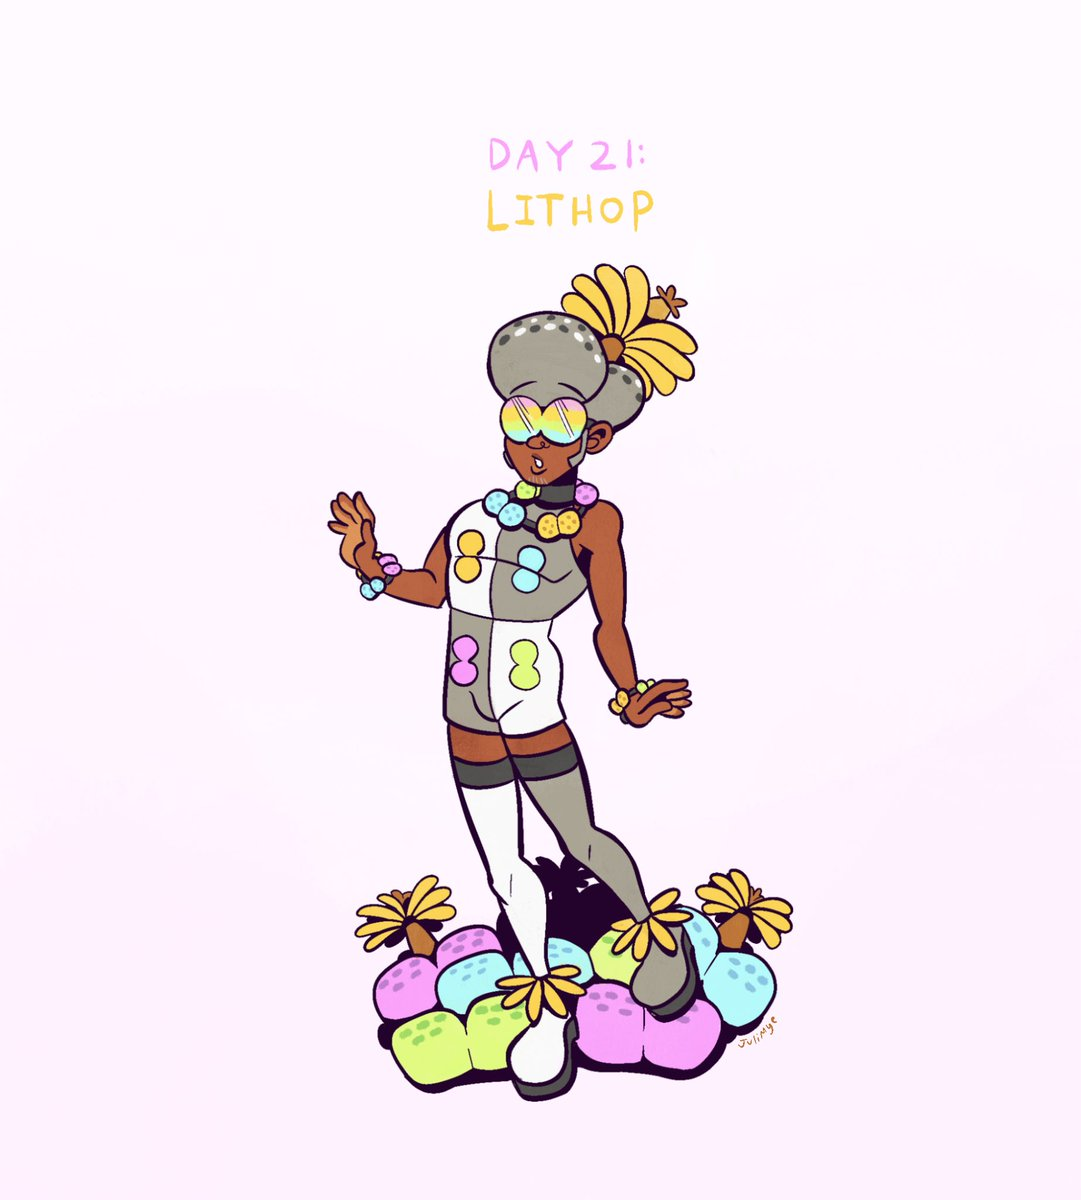 days 21-24! Lithop, Tulip, Daisy, Hydrangea #sketchtember #bloomtober #inktober2020